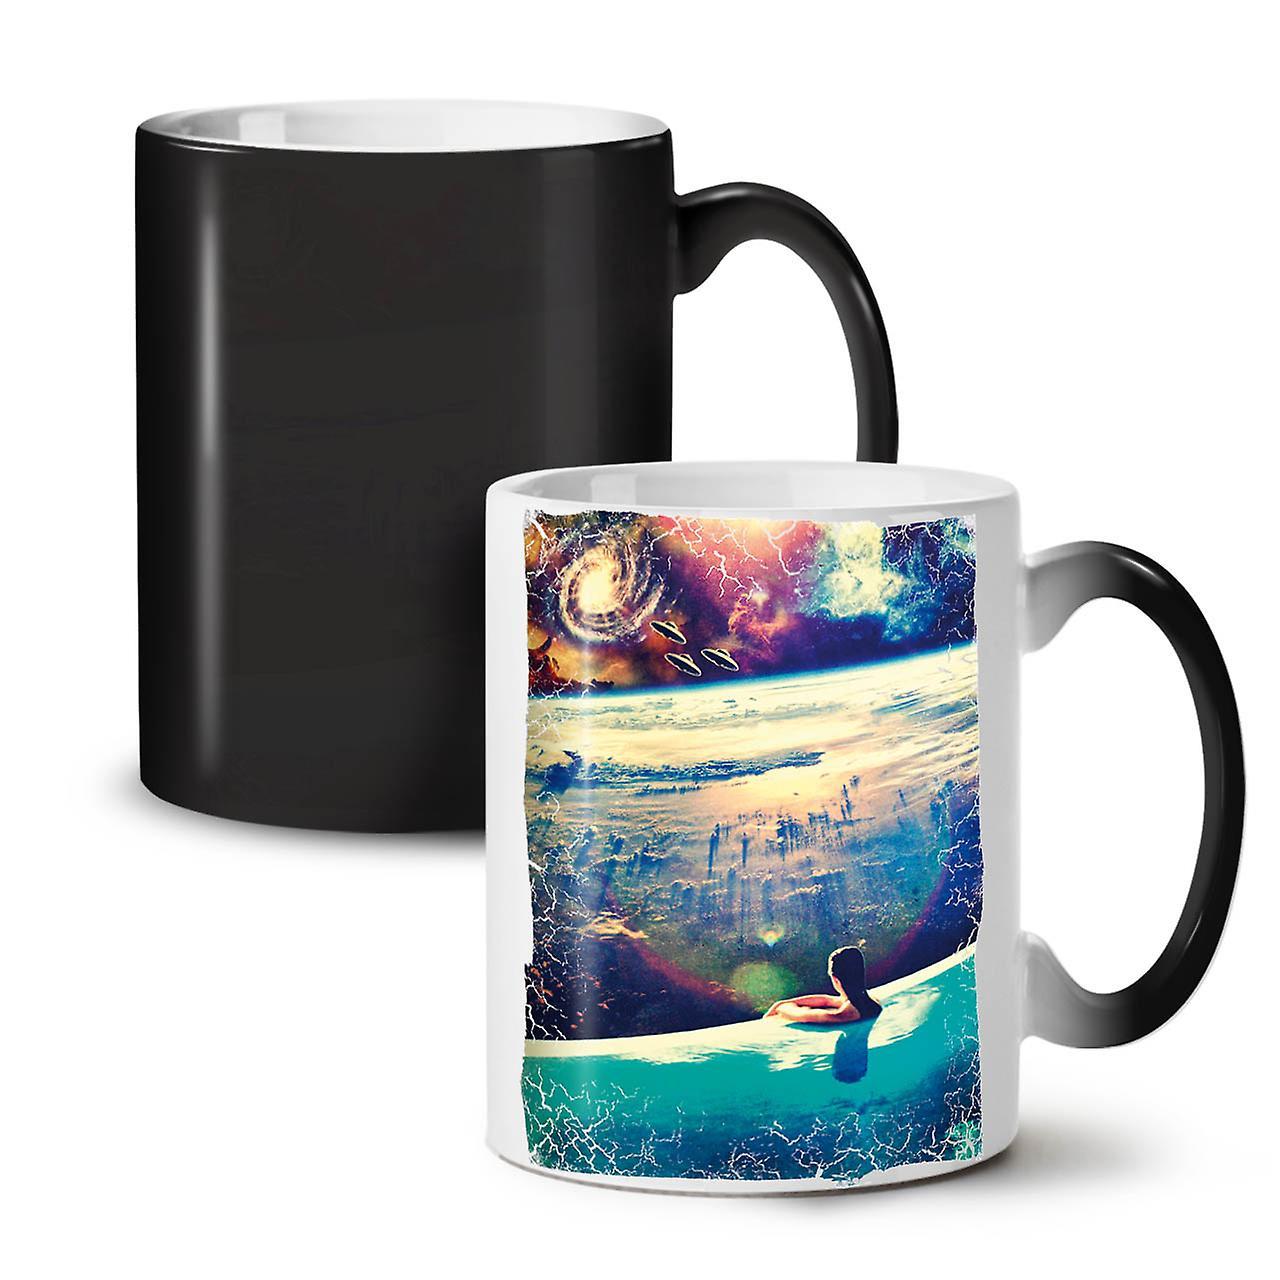 Coffee Black Changing Mug Ceramic Relax OzWellcoda New Mars 11 Tea Colour Invasion Y76mbvyIfg